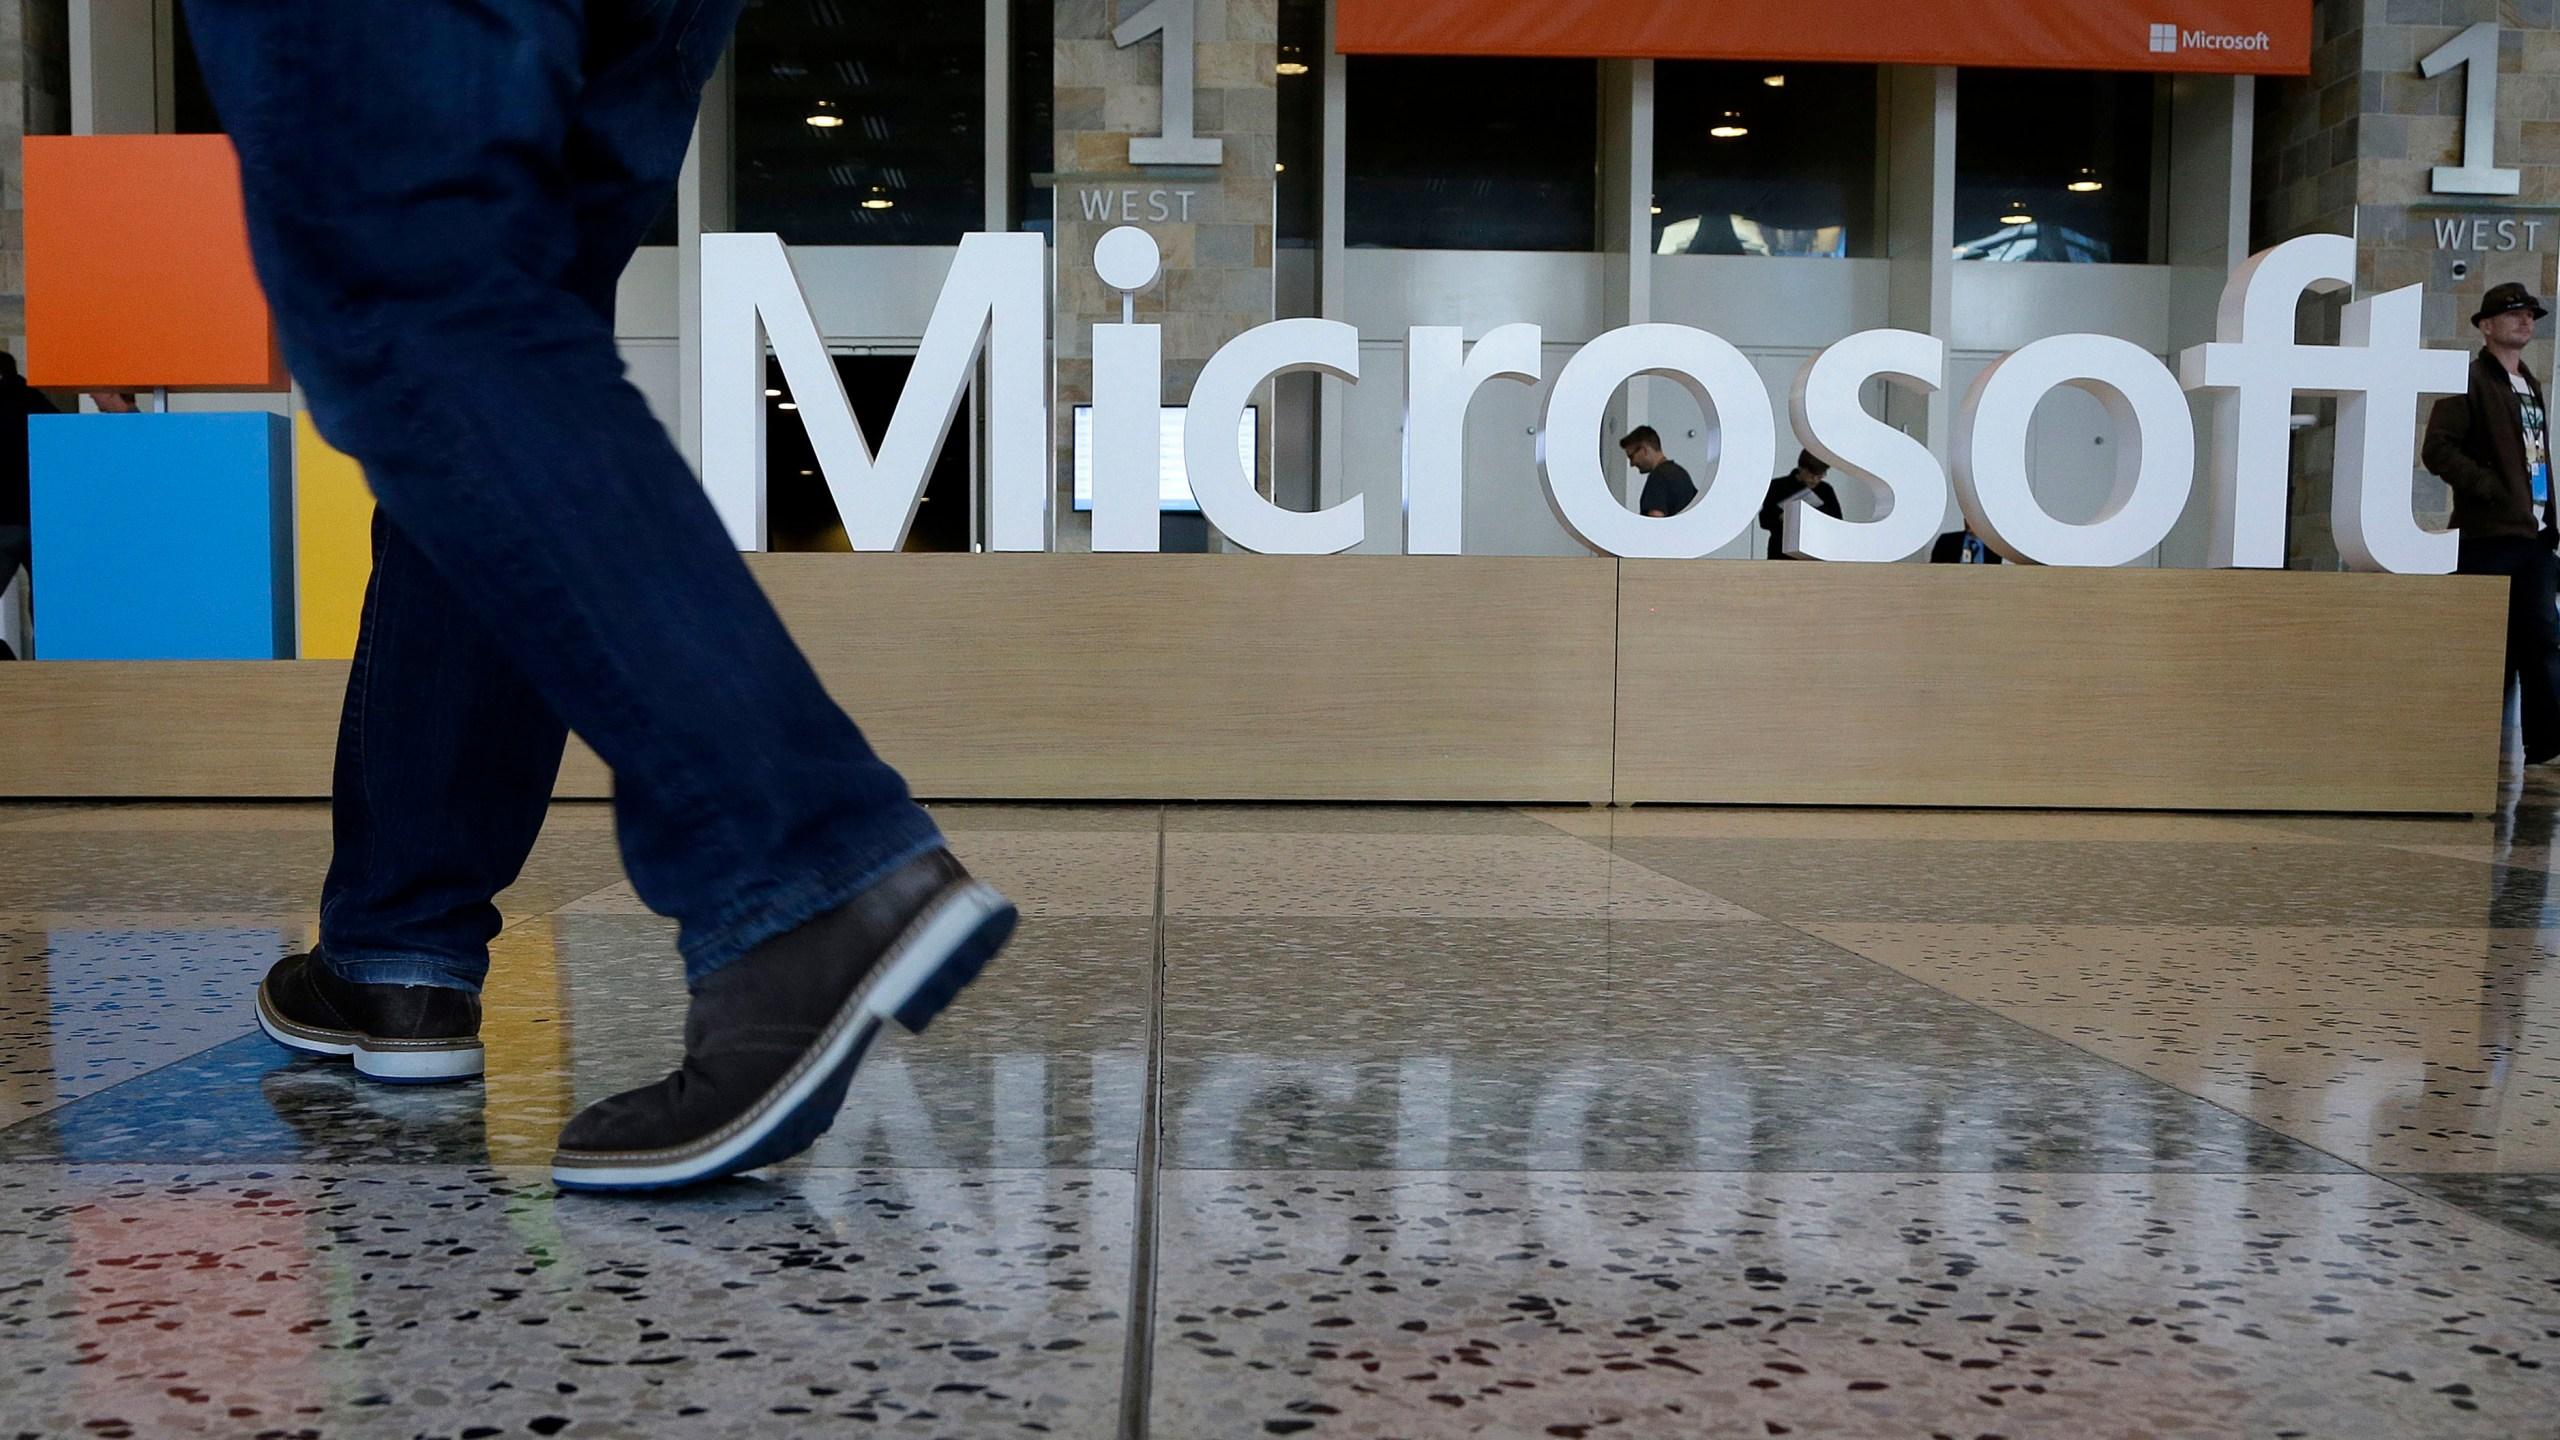 Microsoft_Paid_Parental_Leave_06795-159532.jpg45875490